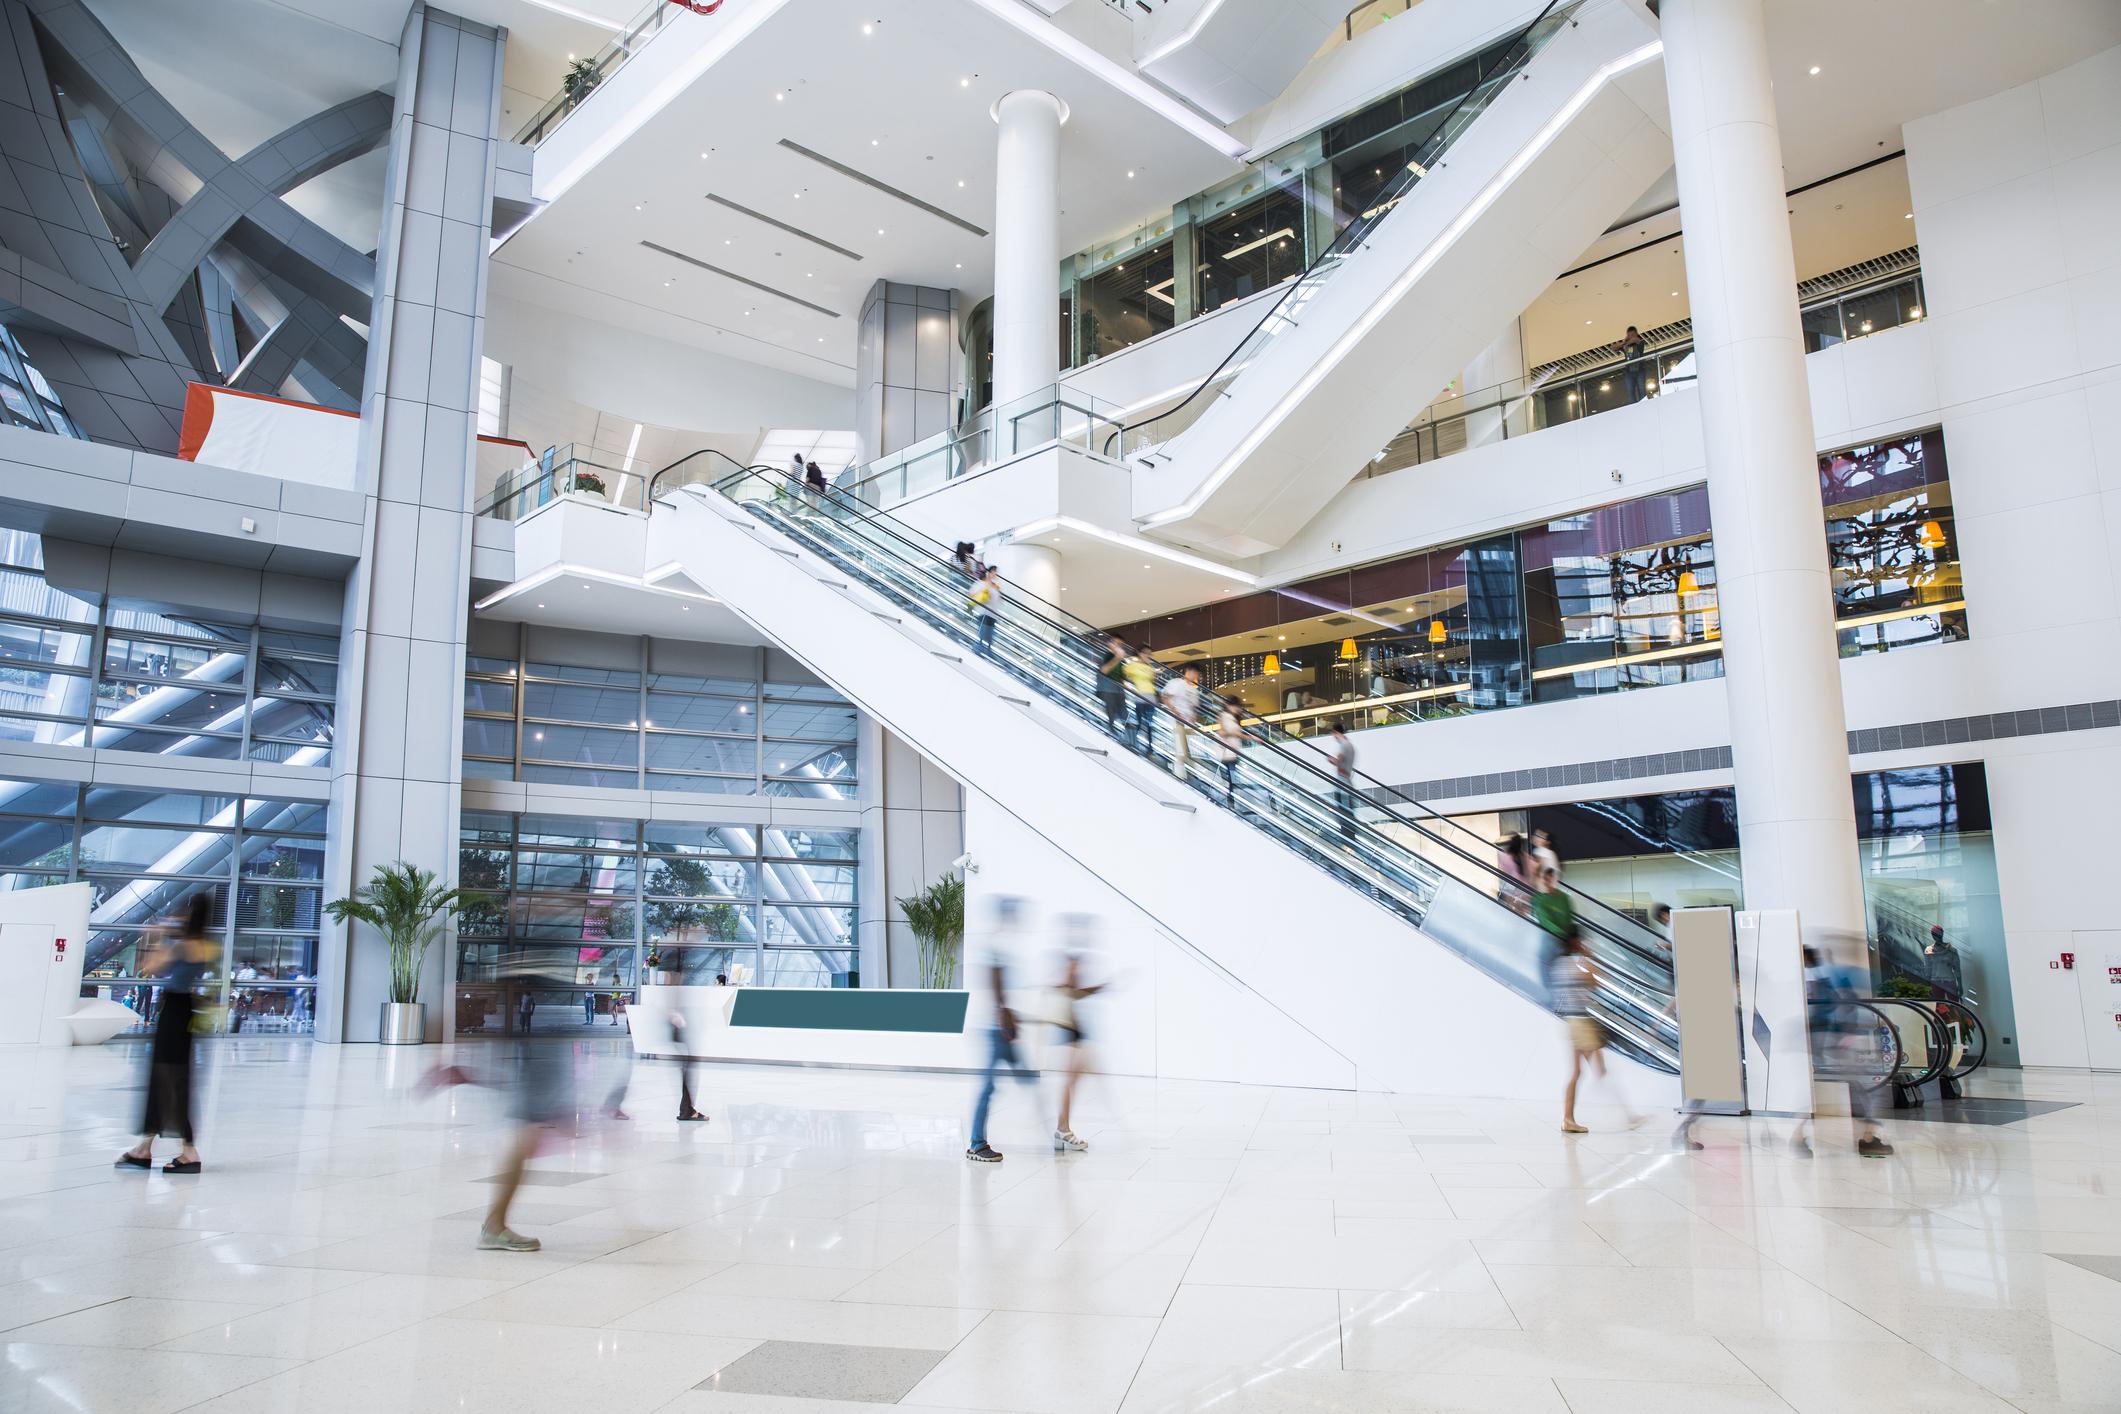 Inside a mall.